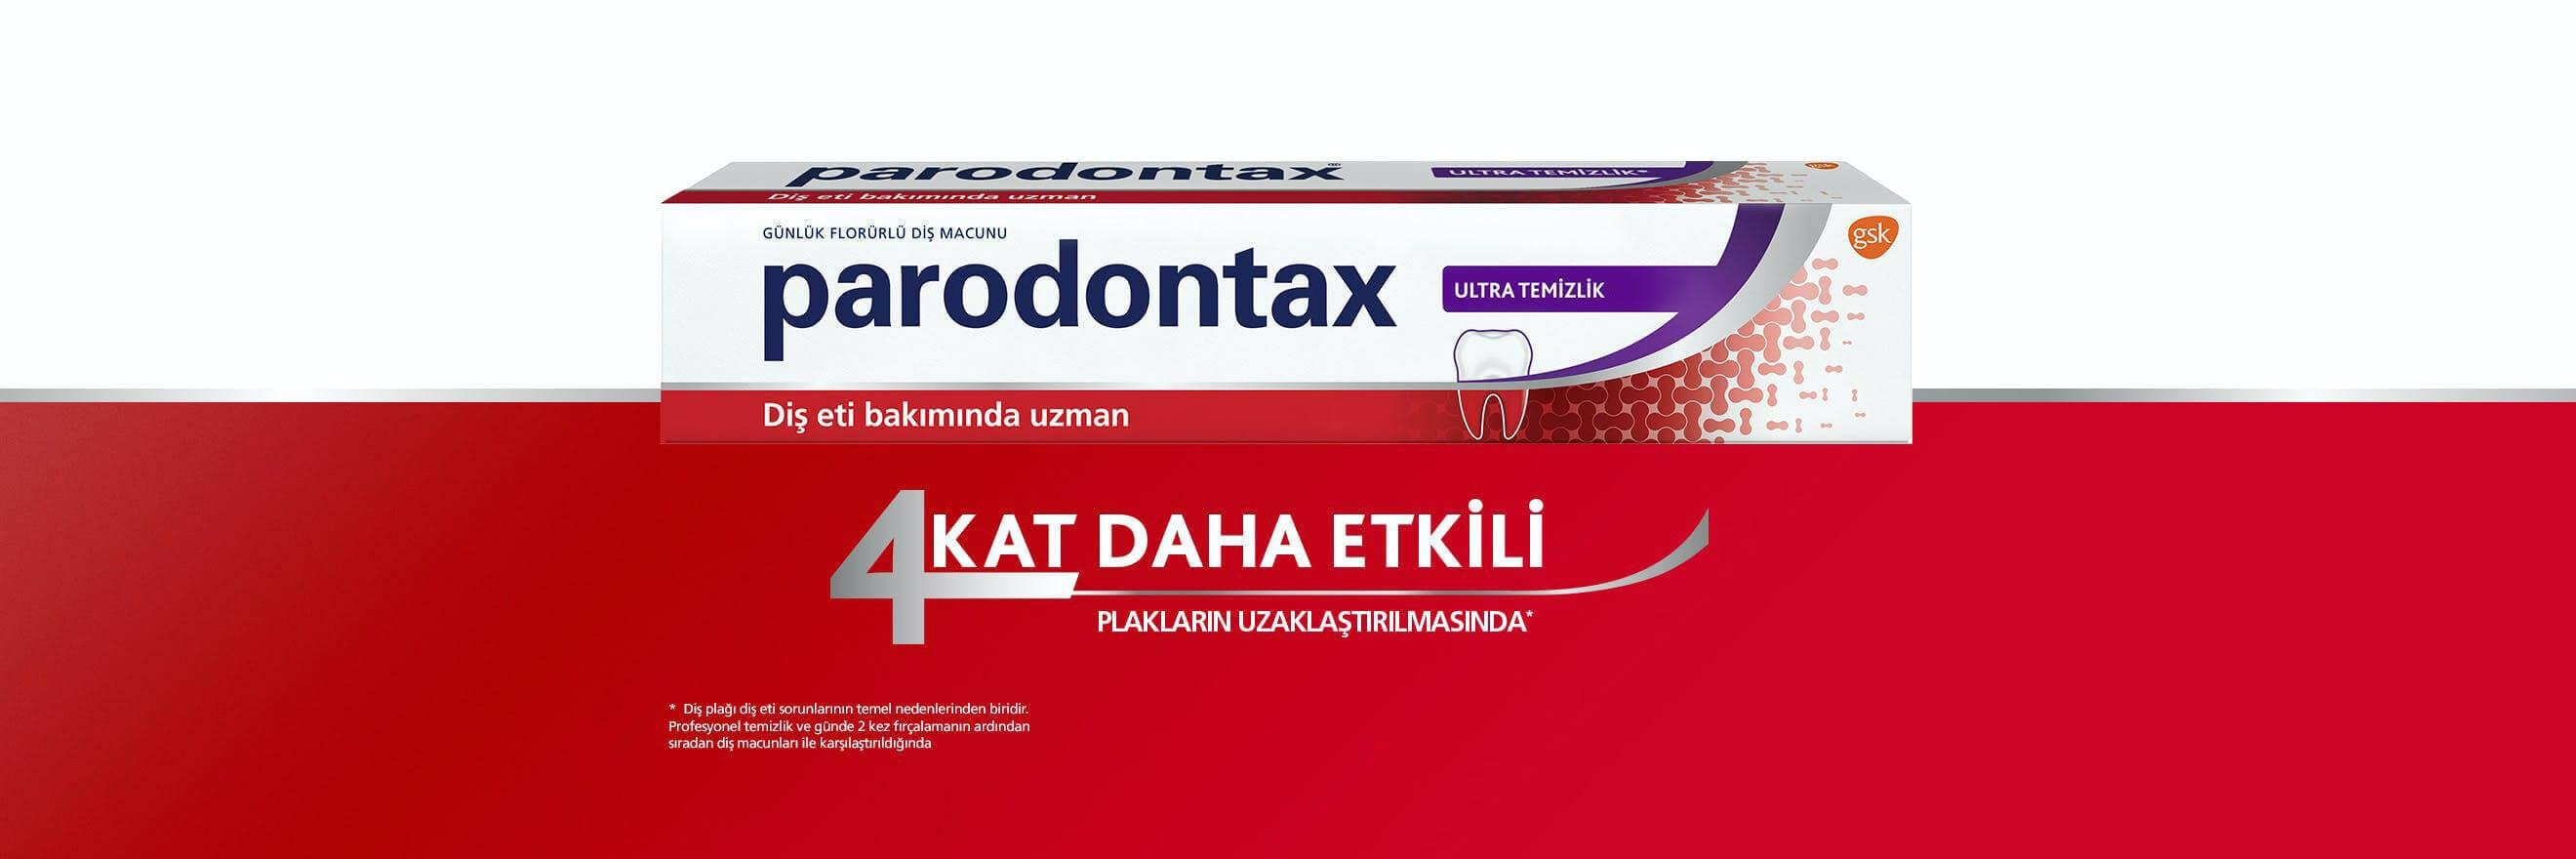 Yeni parodontax Ultra Temizlik diş macunu